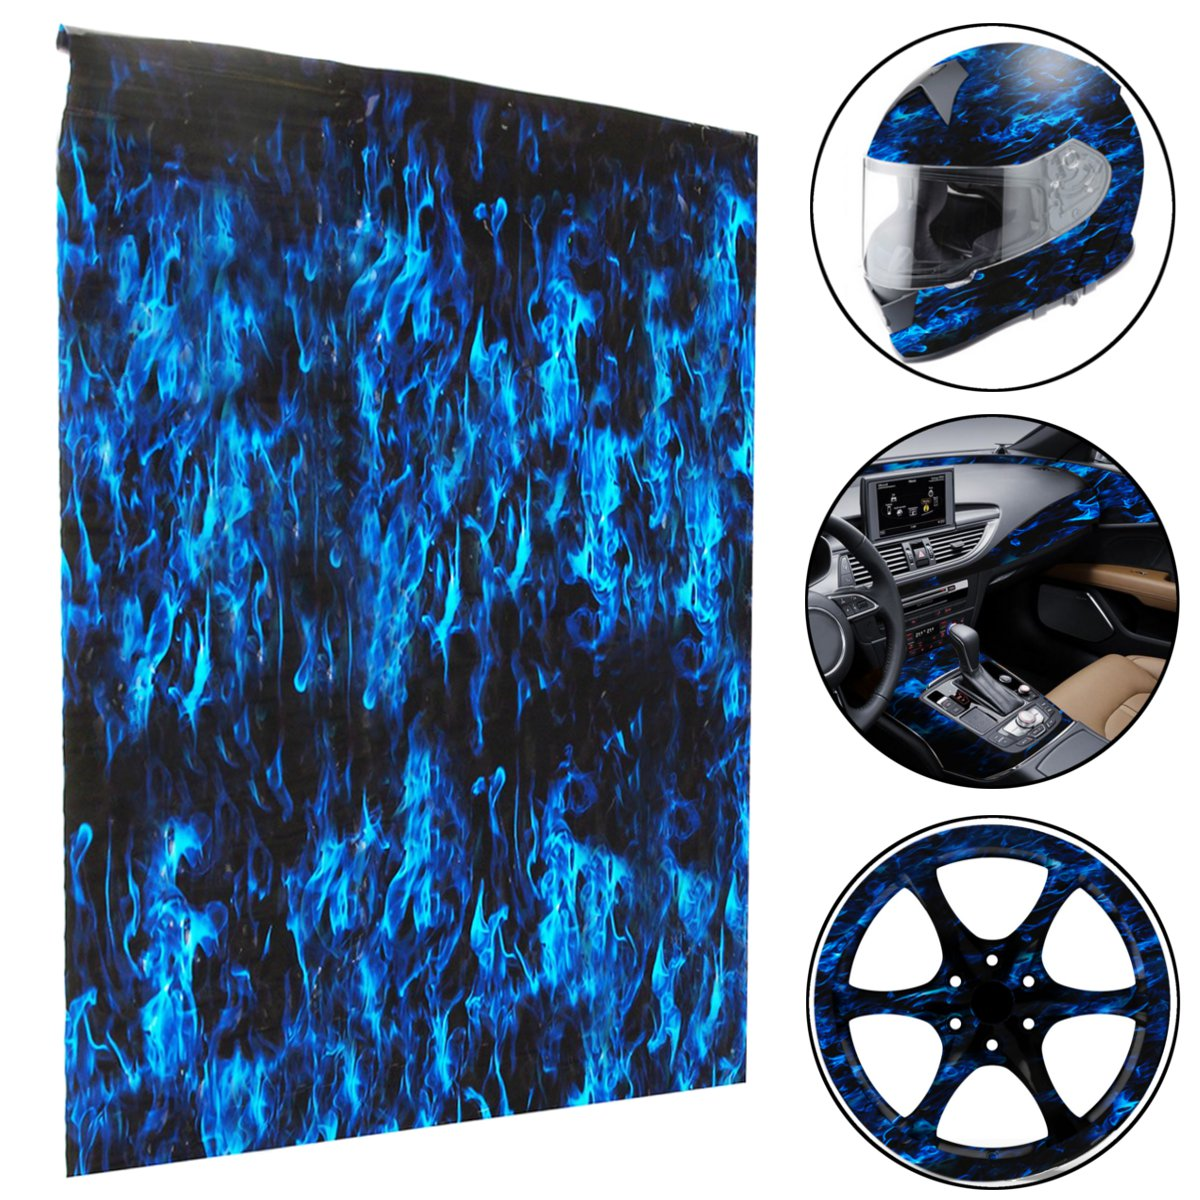 HYDROGRAPHIC WATER TRANSFER HYDRO DIP SINGLE CATALOG SHEET FILM BLUE EYE CREEPER